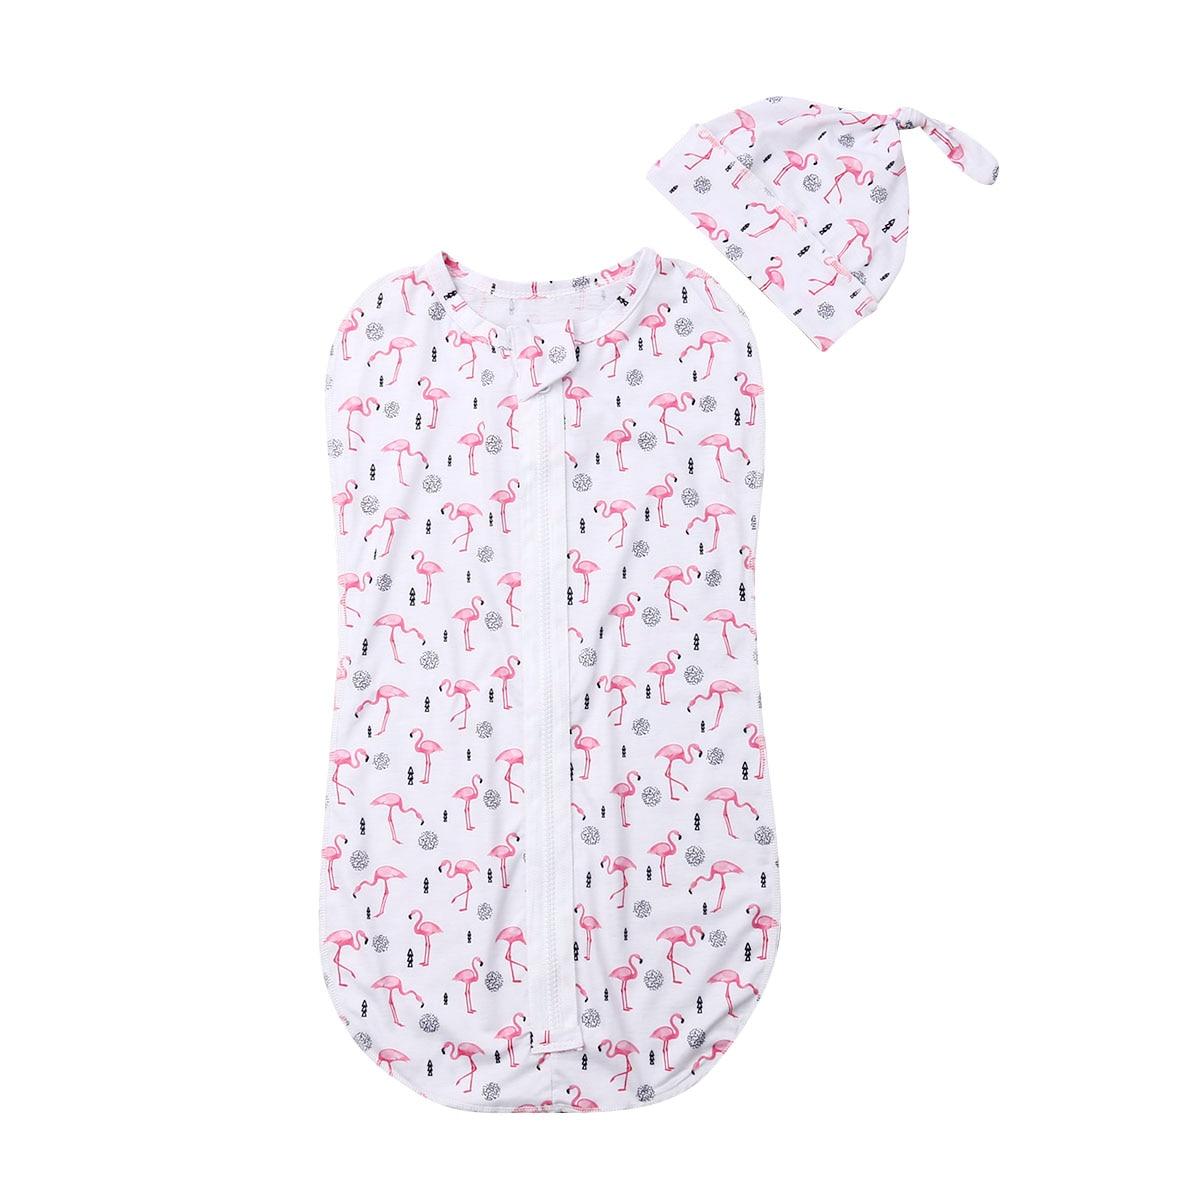 2PCS Soft Baby Sleeping Bags Cotton Swaddle Cartoon Blanket Newborn Zipper Wrap Swaddling Blanket 0-6M